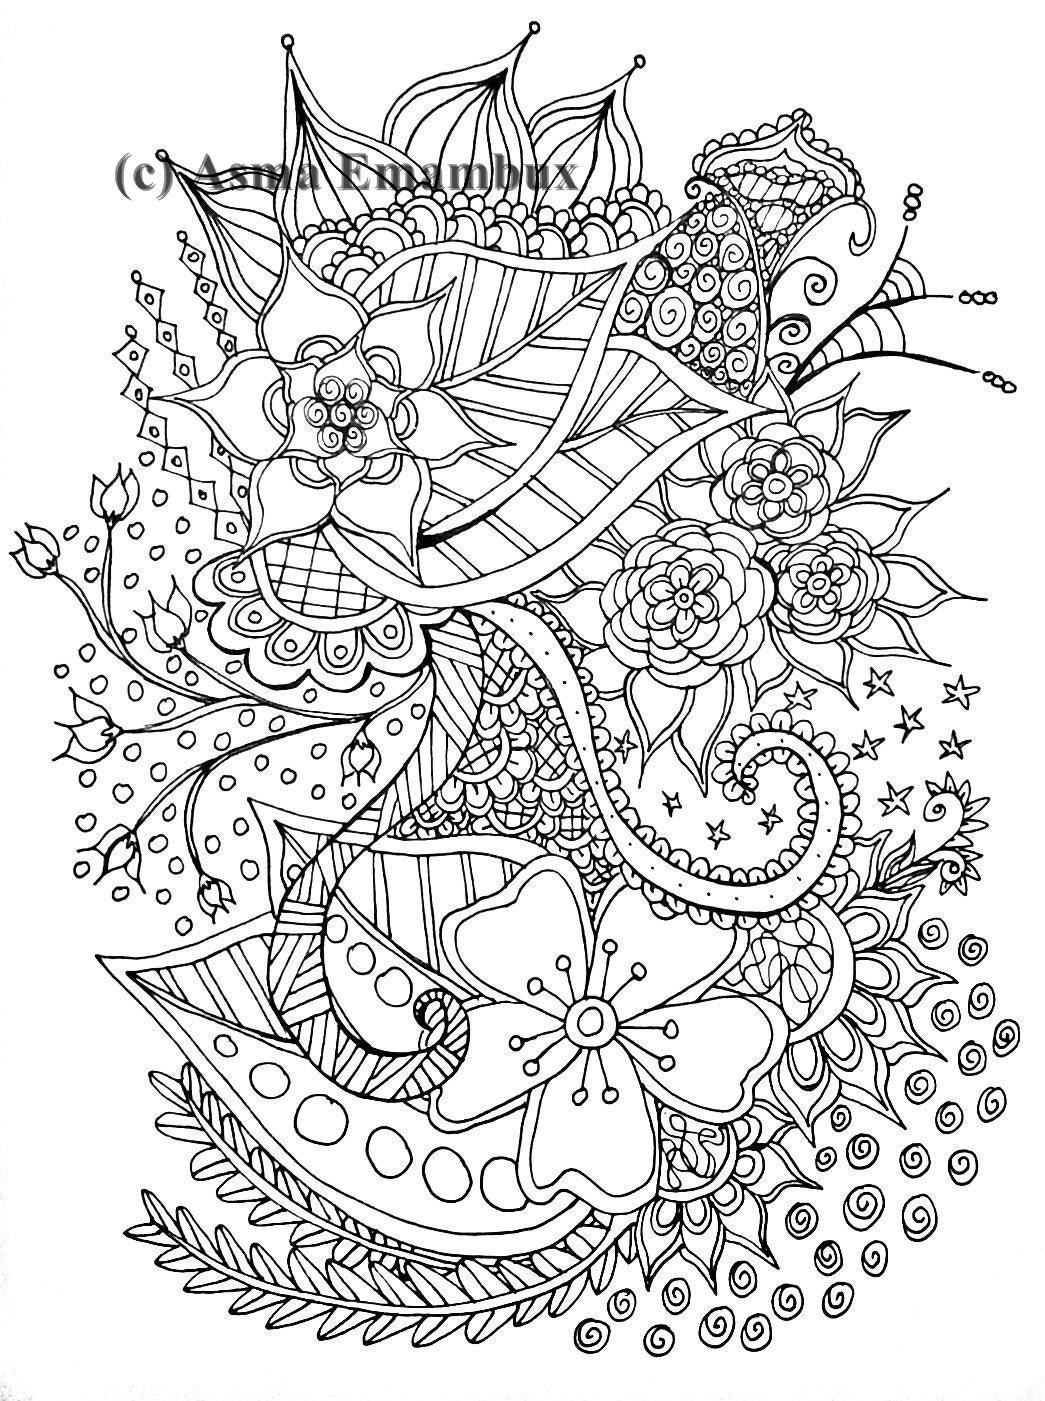 Flower Zendoodle Coloring Page